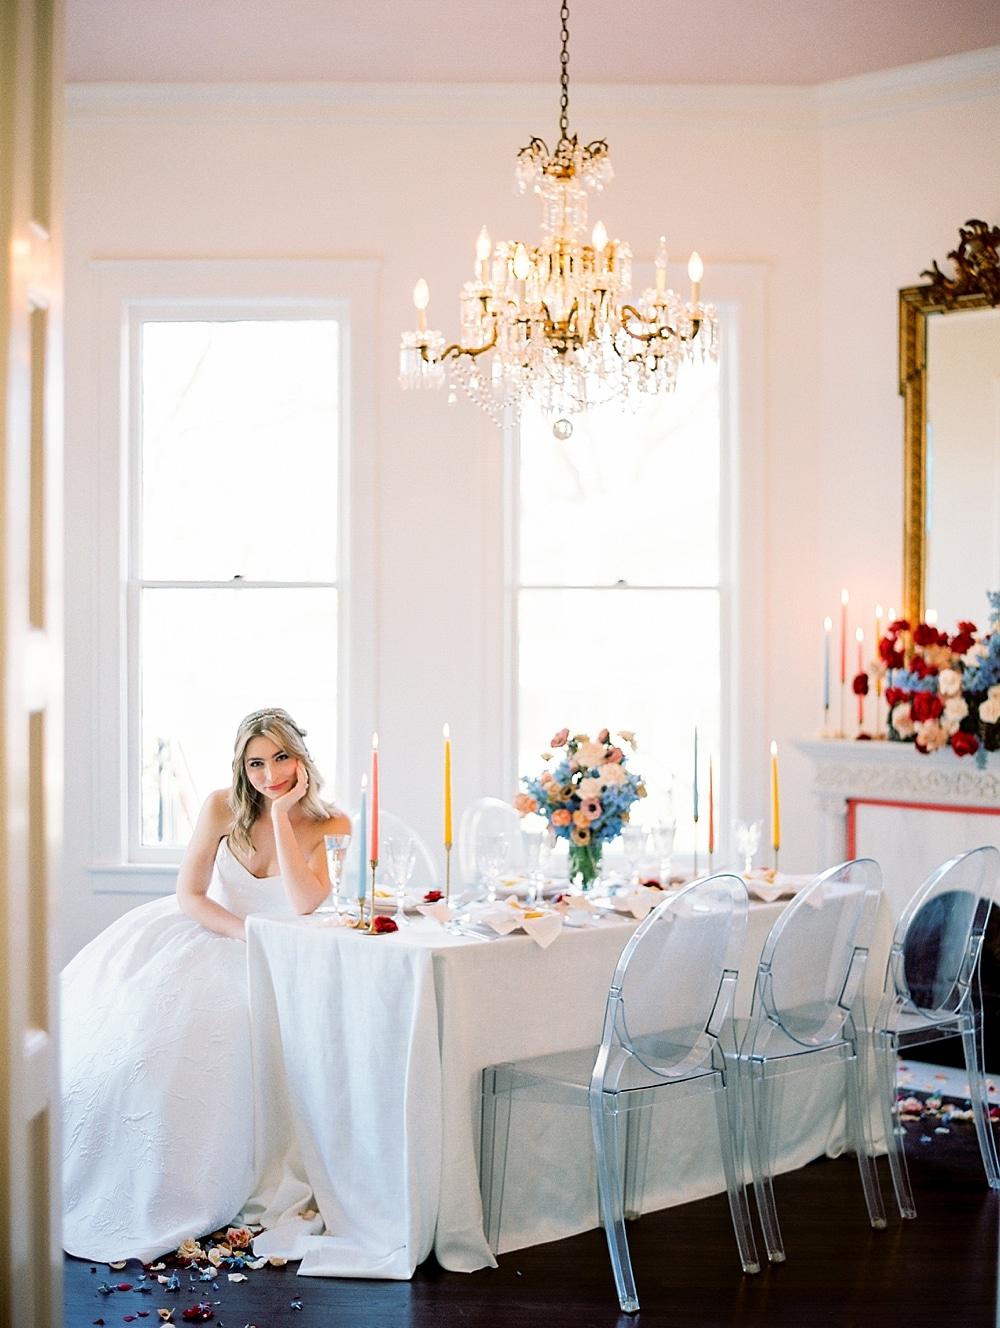 kristin-la-voie-photography-austin-wedding-photographer-woodbine-mansion-32